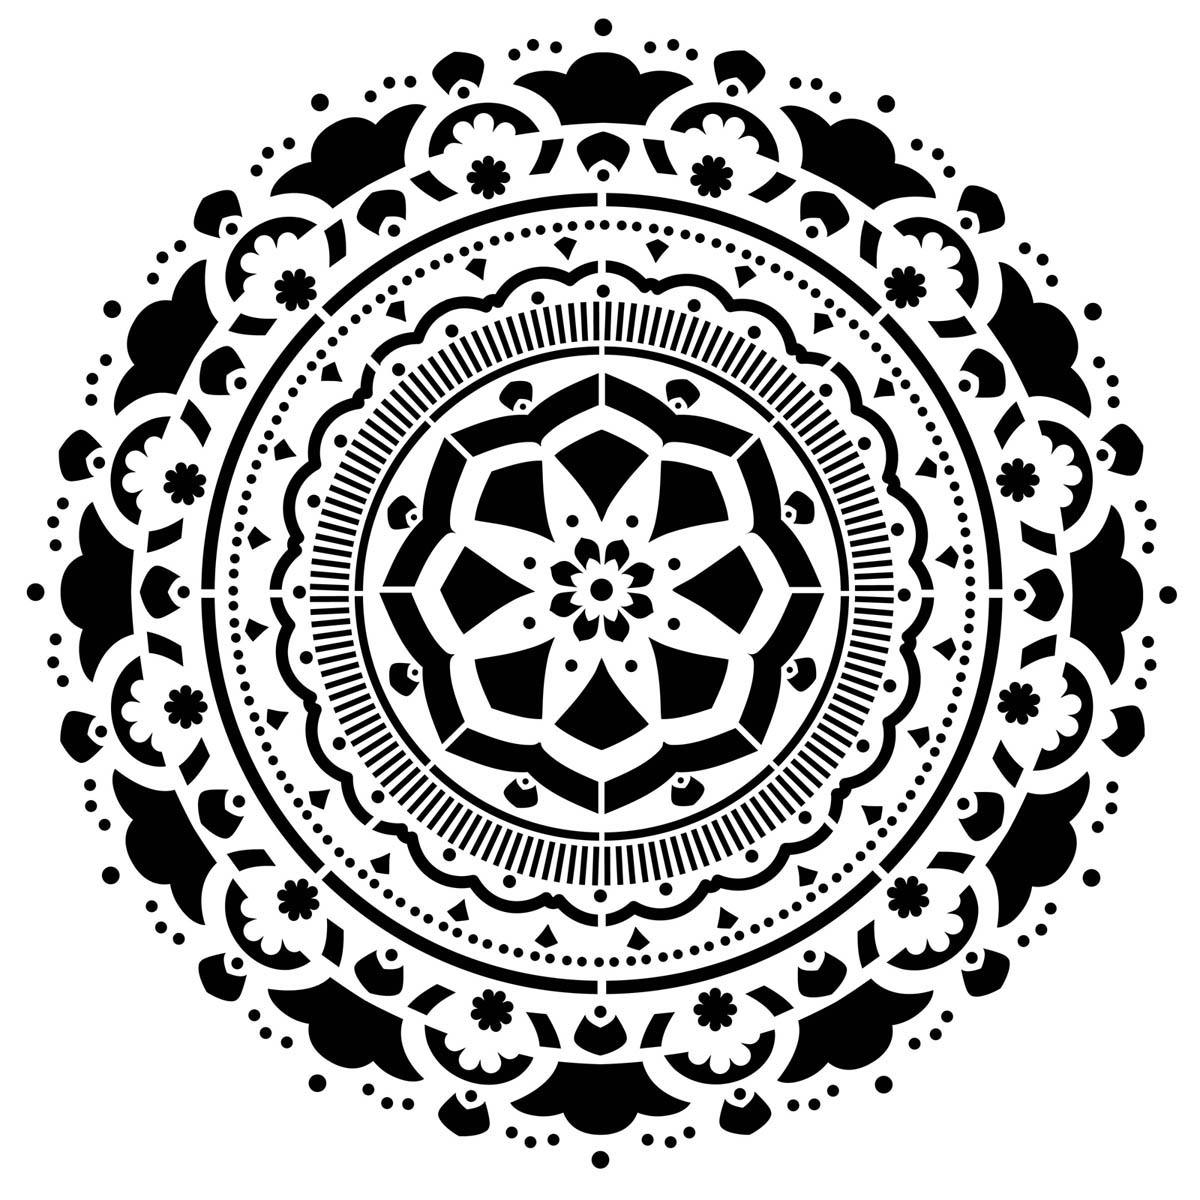 FolkArt ® Painting Stencils - Large - Mandala Burst - 31584